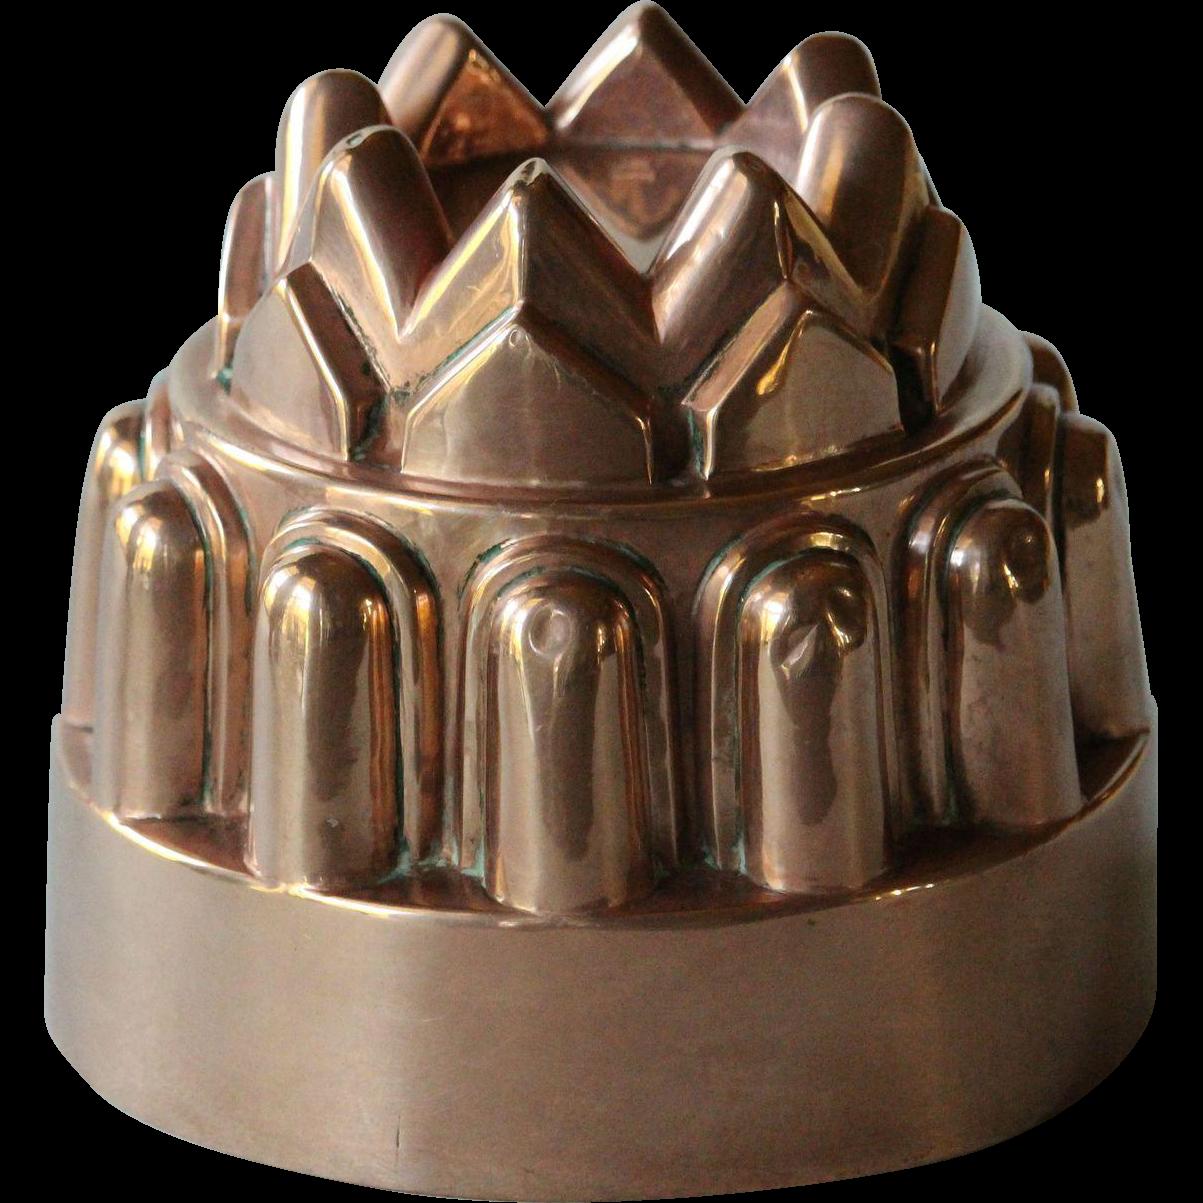 Antique English Copper Jelly Mold - 19th Century Victorian Copper Mould